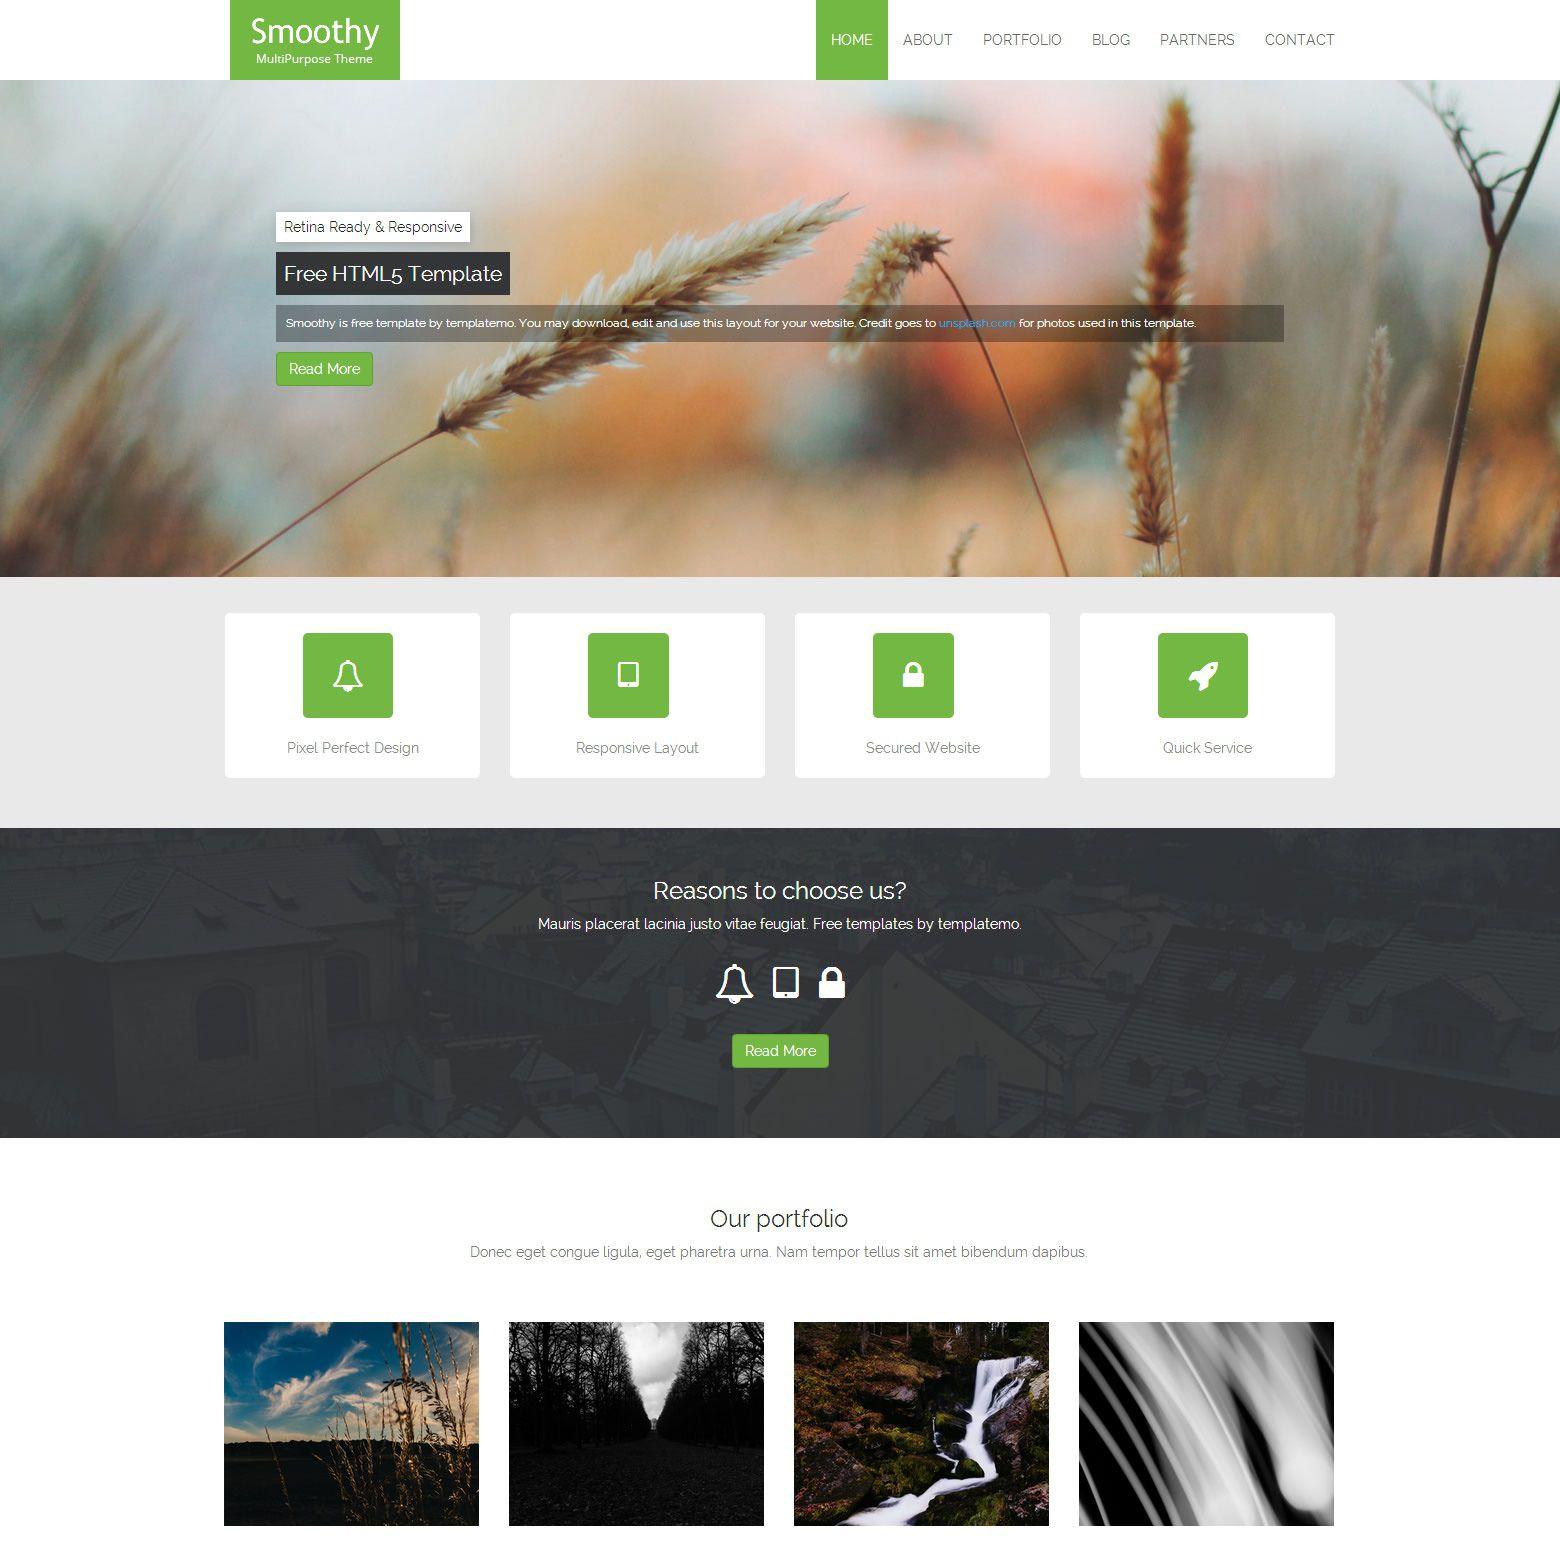 008 Best Dream Weaver Web Template Inspiration  TemplatesFull